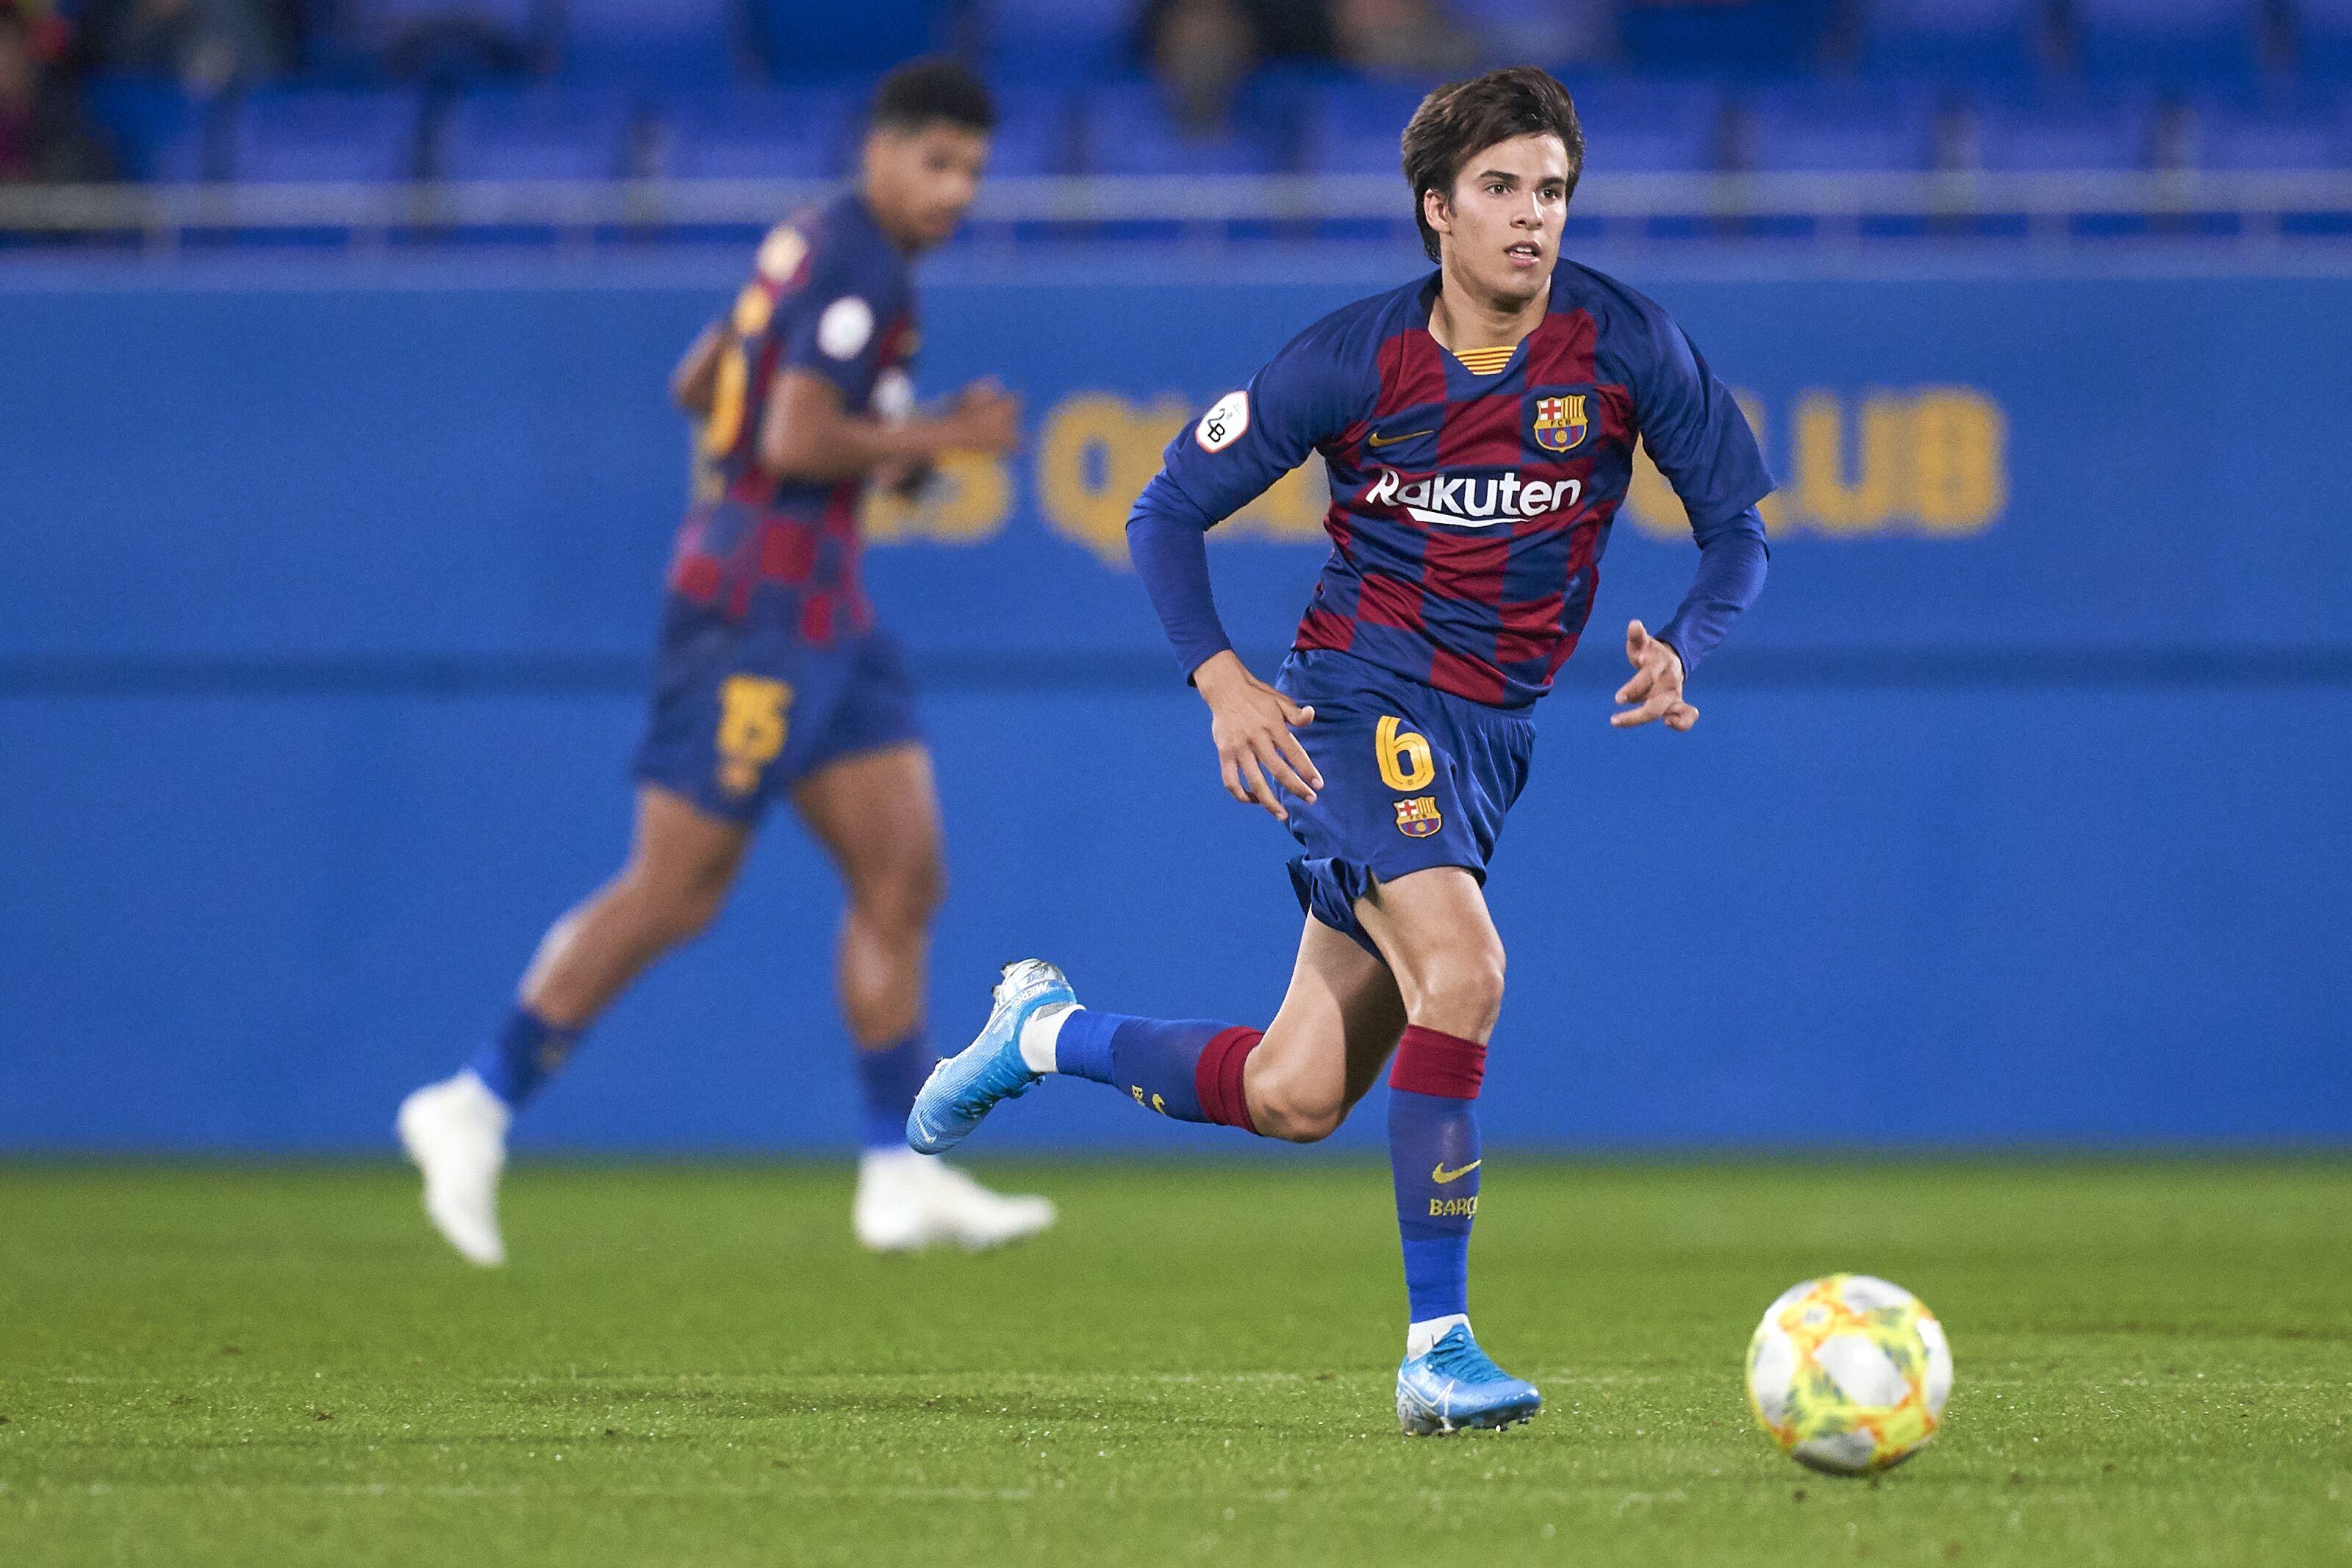 6 breakthrough stars from Barcelona's La Masia for 2020